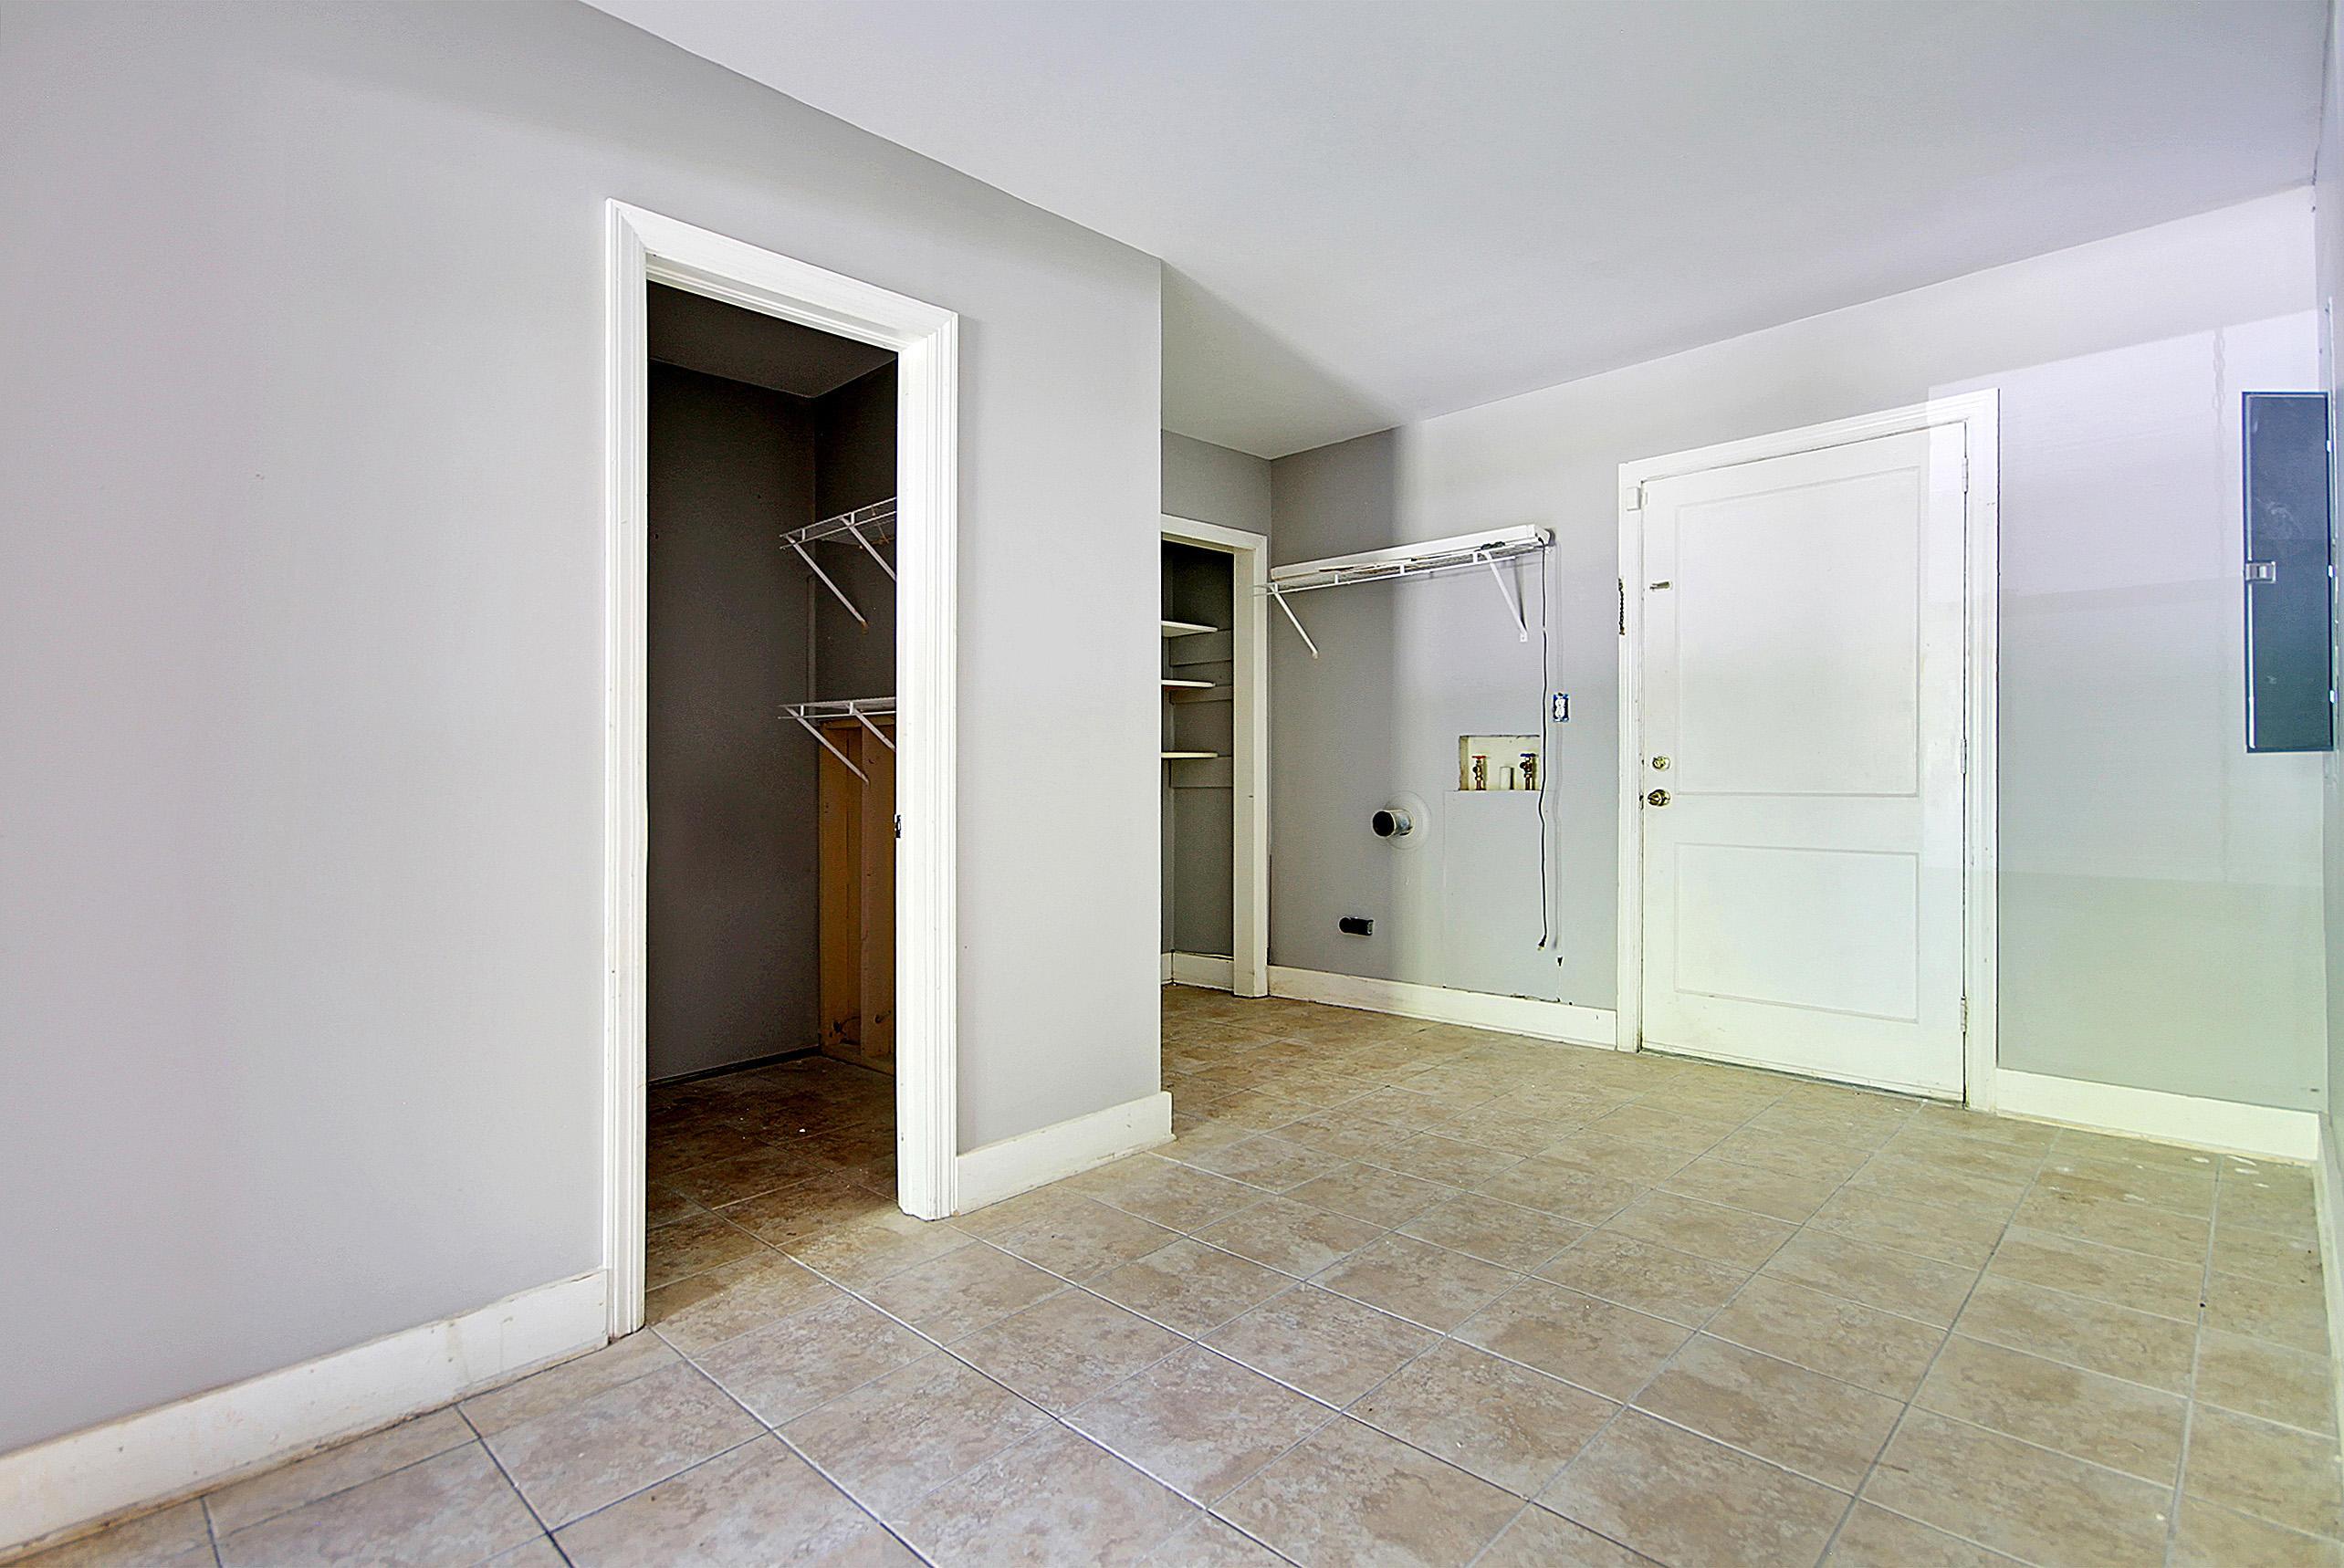 Northbridge Terrace Homes For Sale - 1094 Northbridge, Charleston, SC - 13